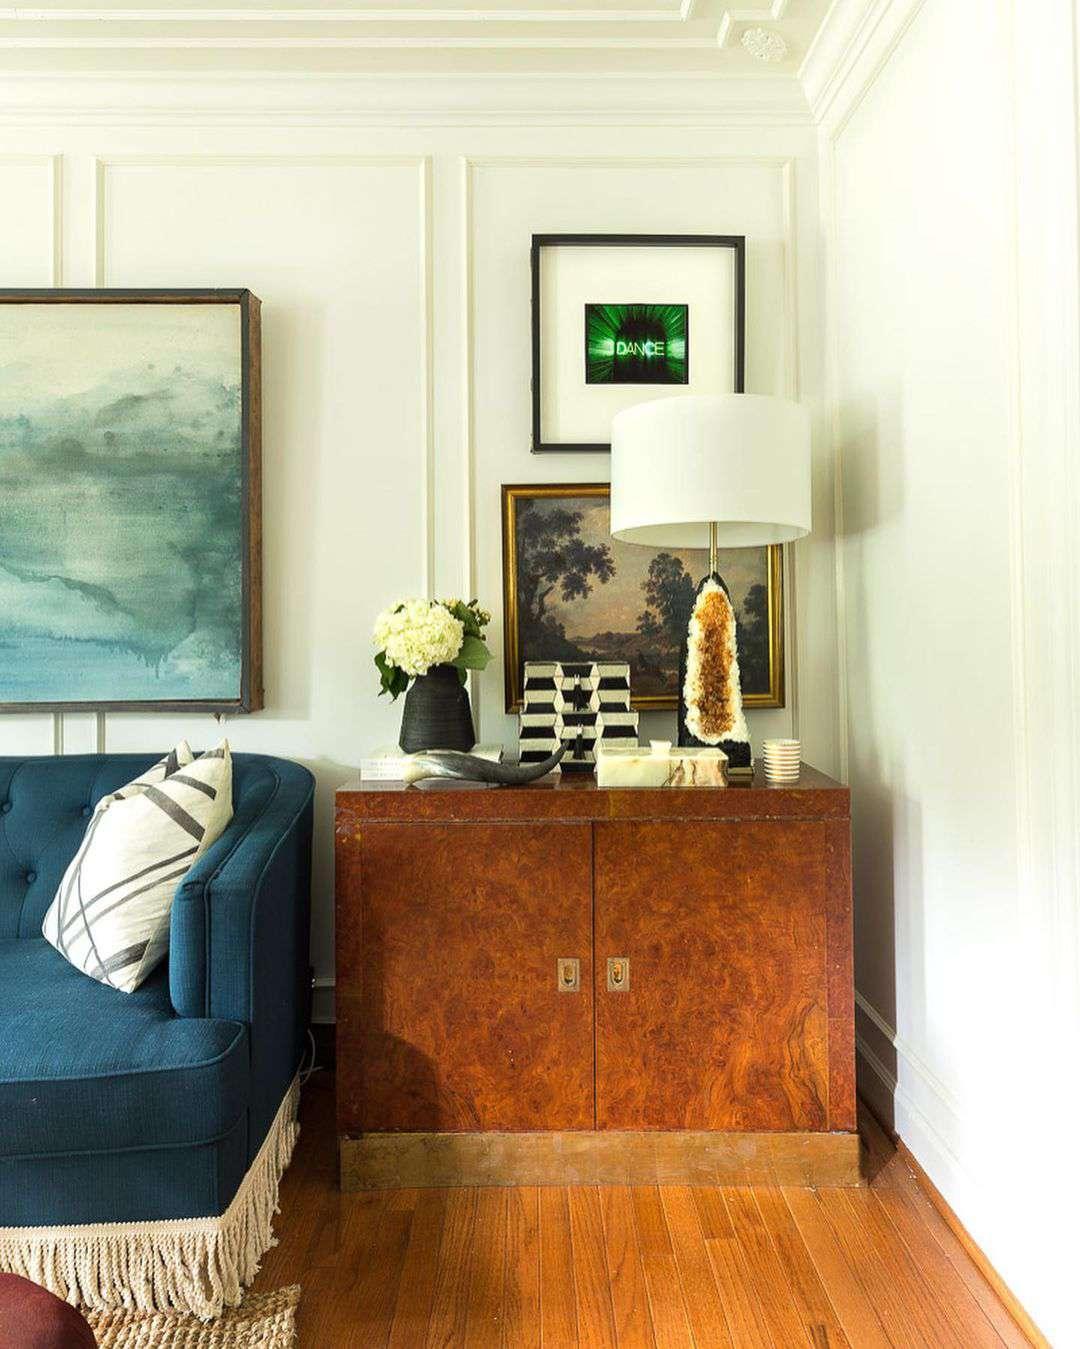 Burl wood dresser with decorative accents.